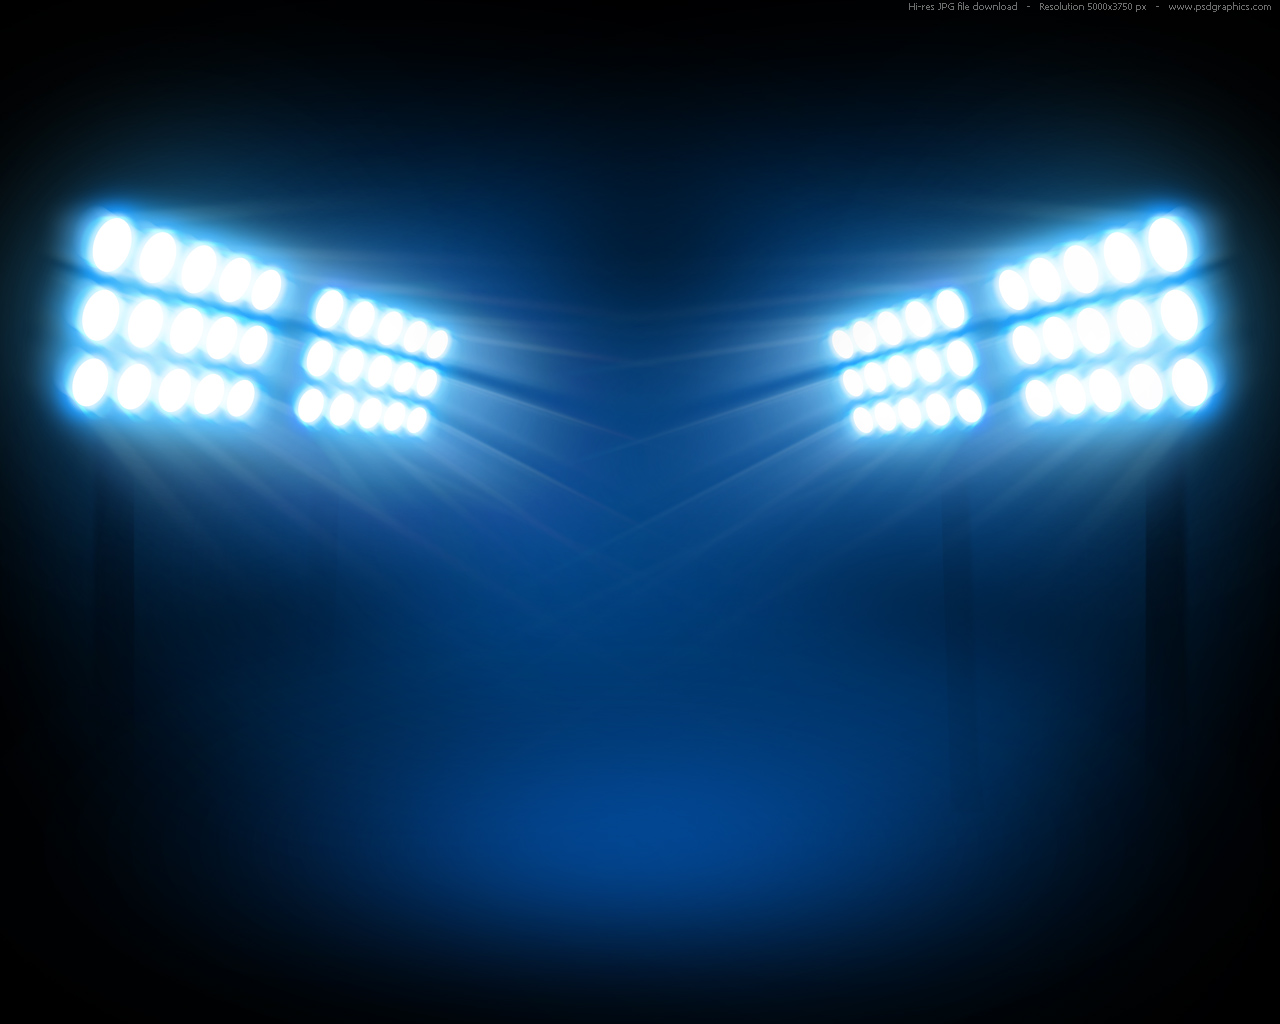 Portrait Lighting Effect App